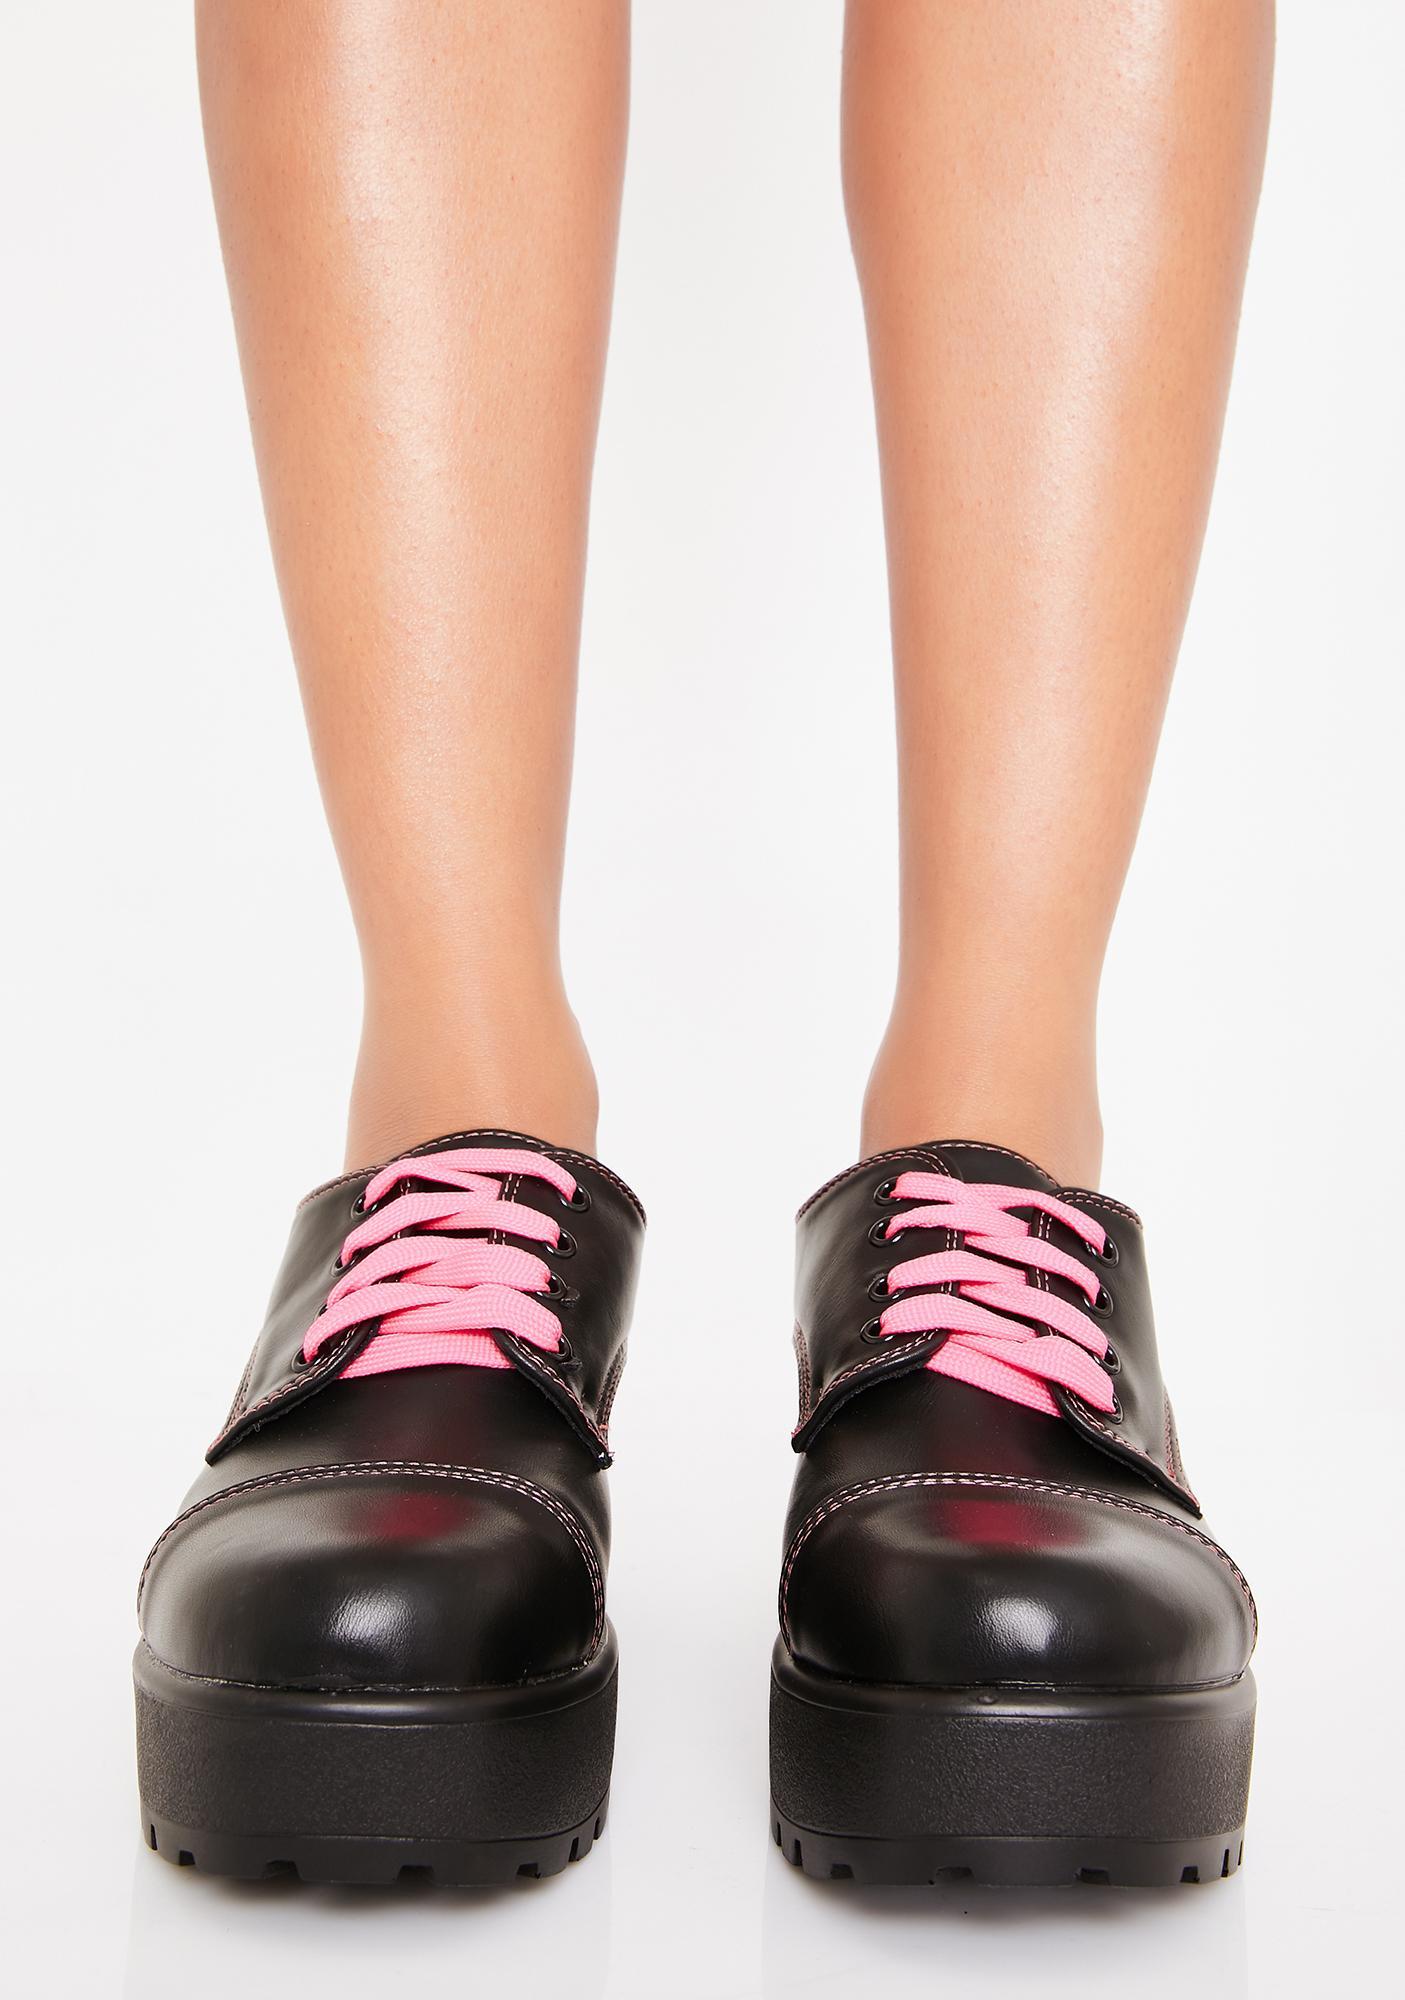 Koi Footwear Ario Platform Oxfords